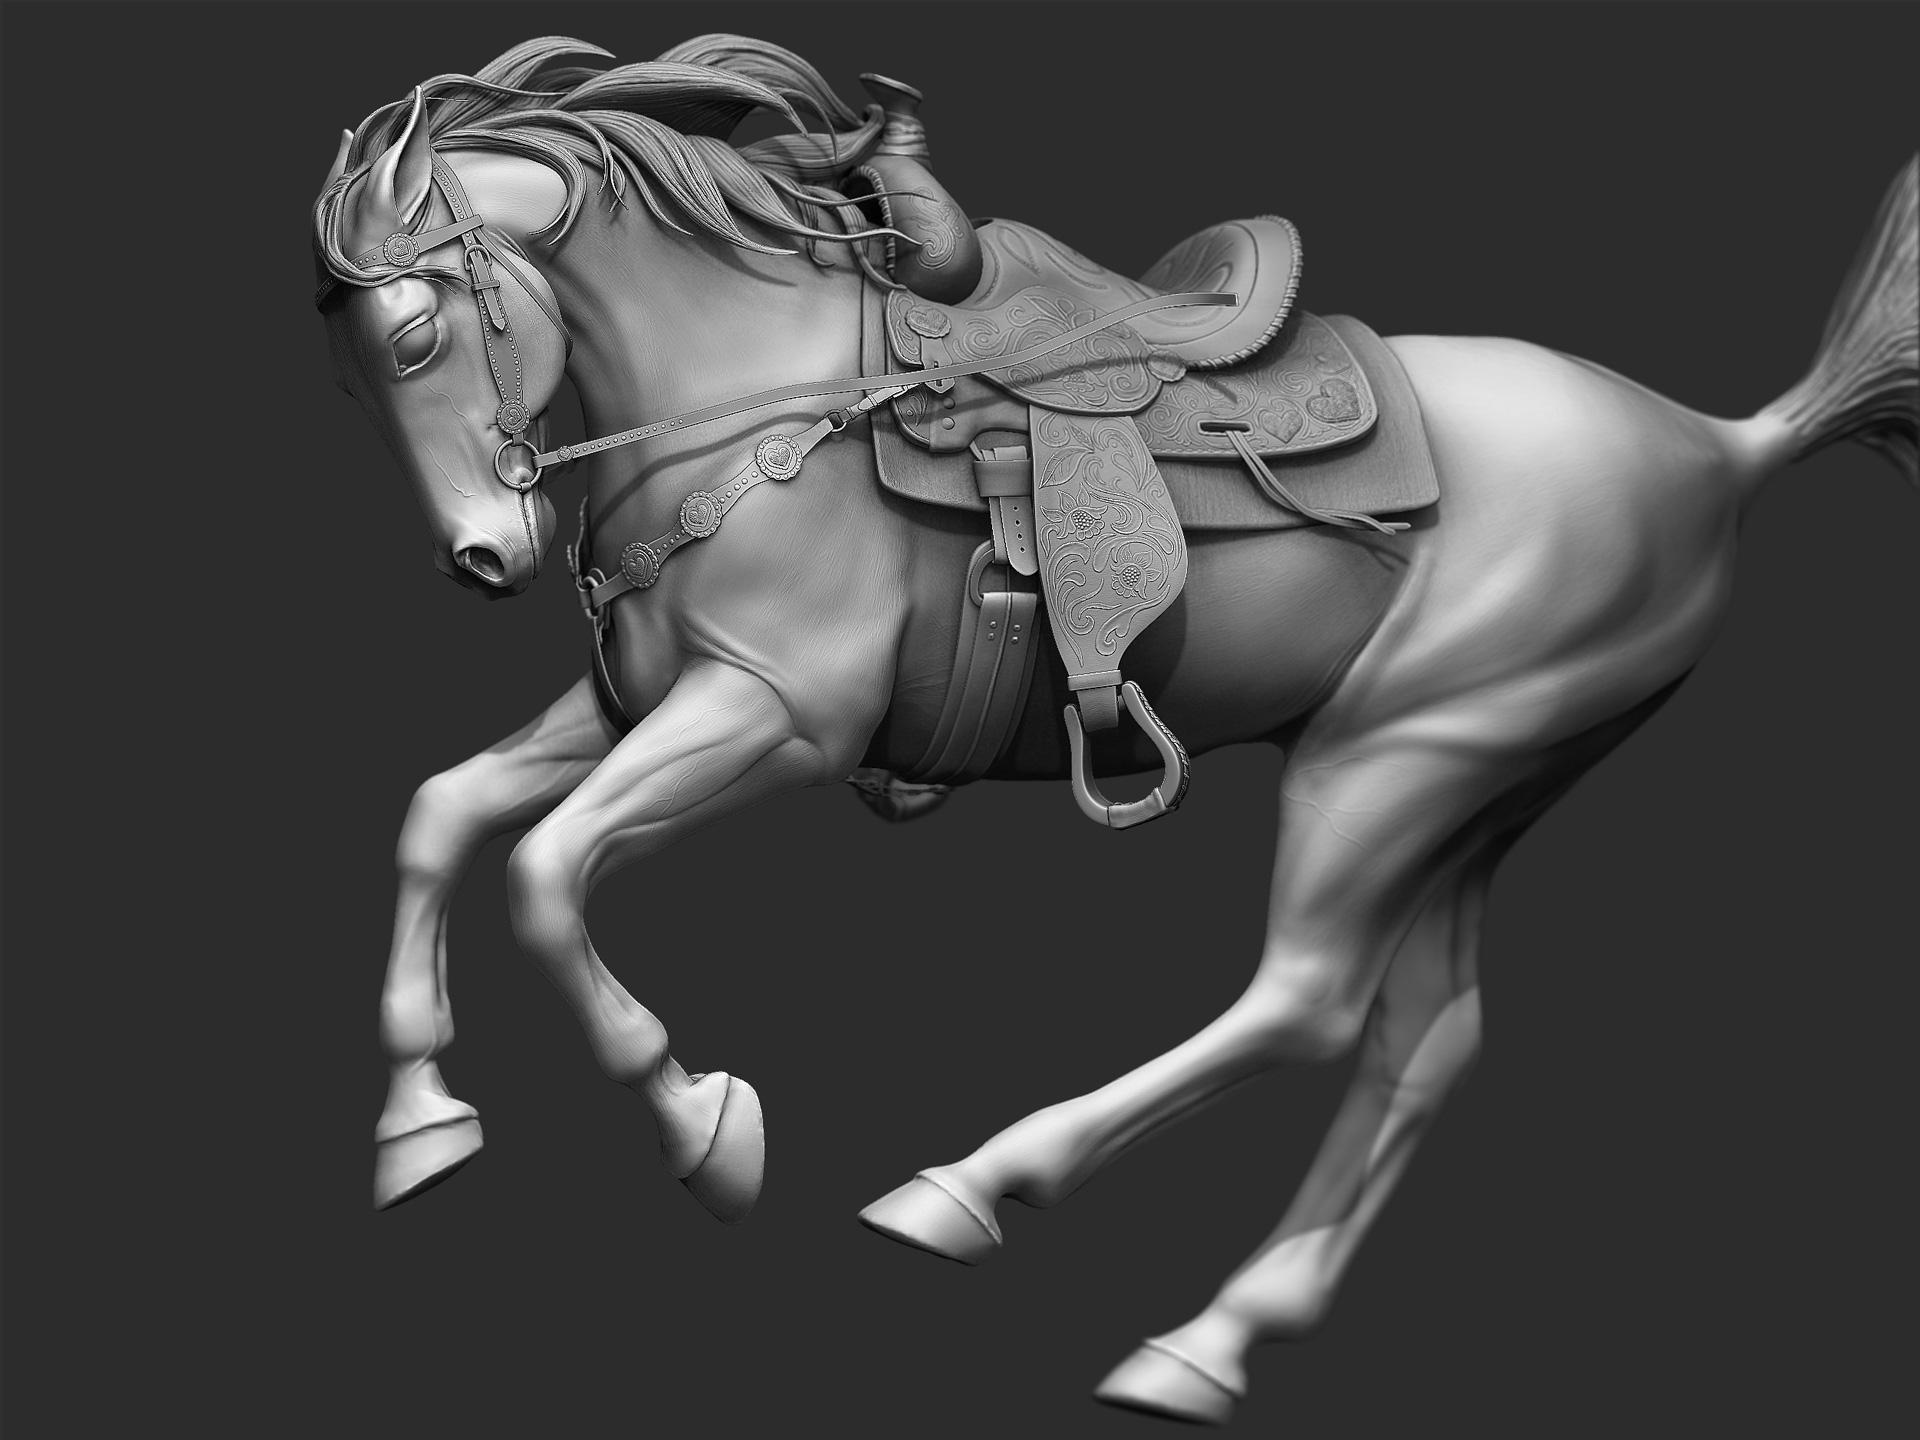 Zbrush Sculpt / Horse | Jacqueline Adelmeyer